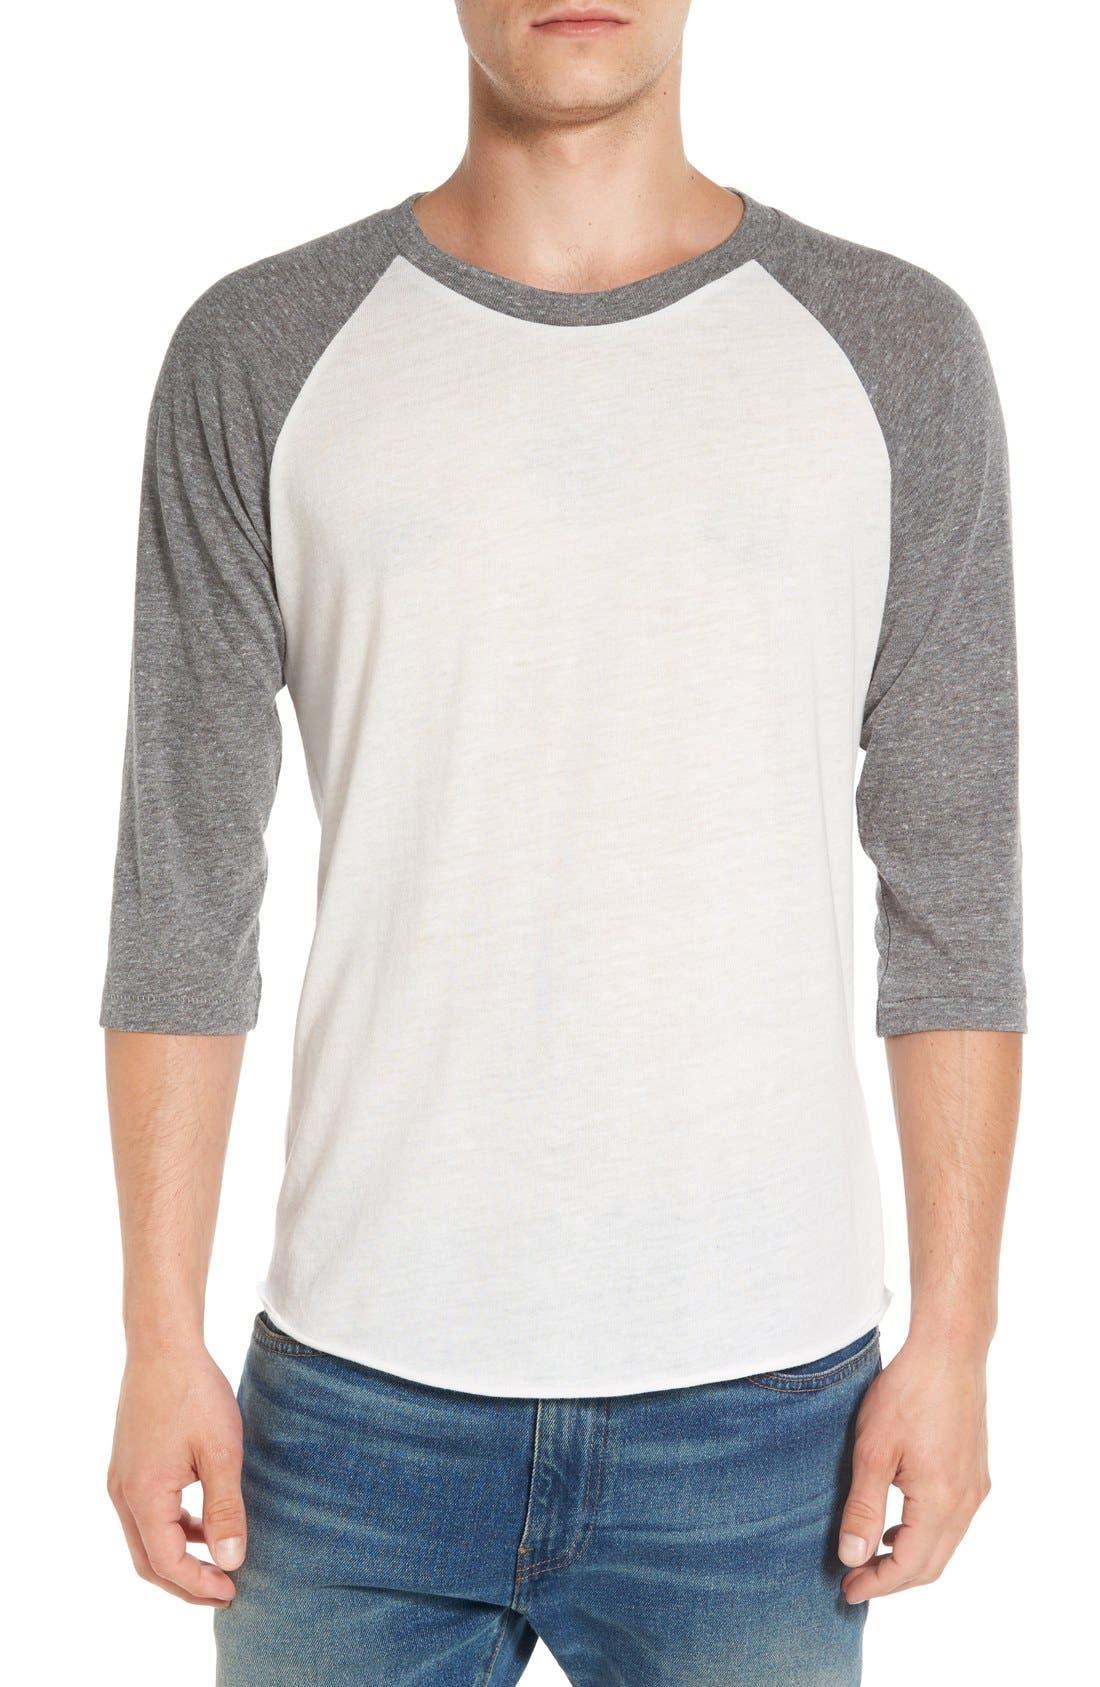 Alternative Colorblock Baseball T-Shirt